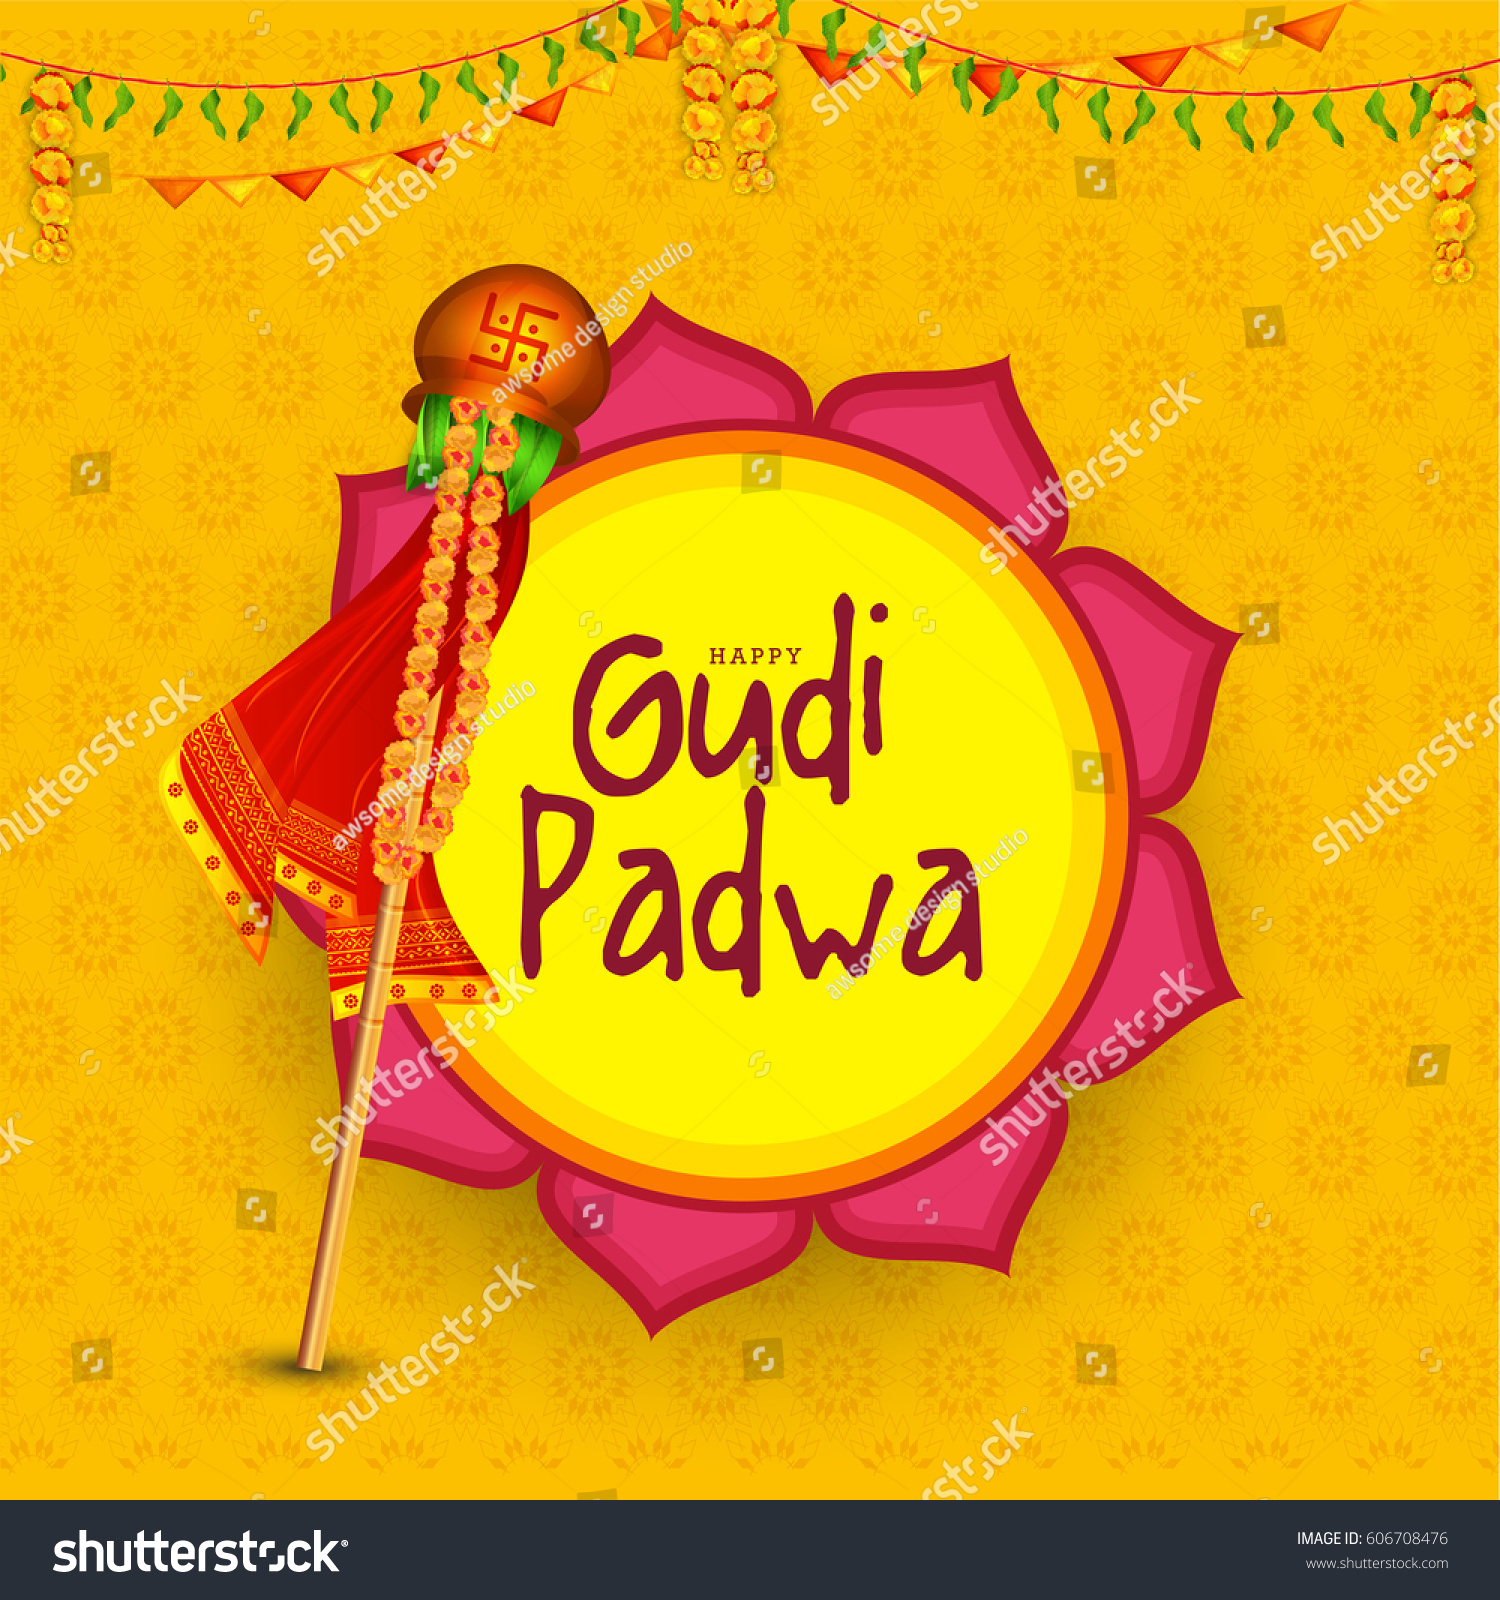 Gudi Padwa Celebration Greeting Card Background Stock Photo Photo